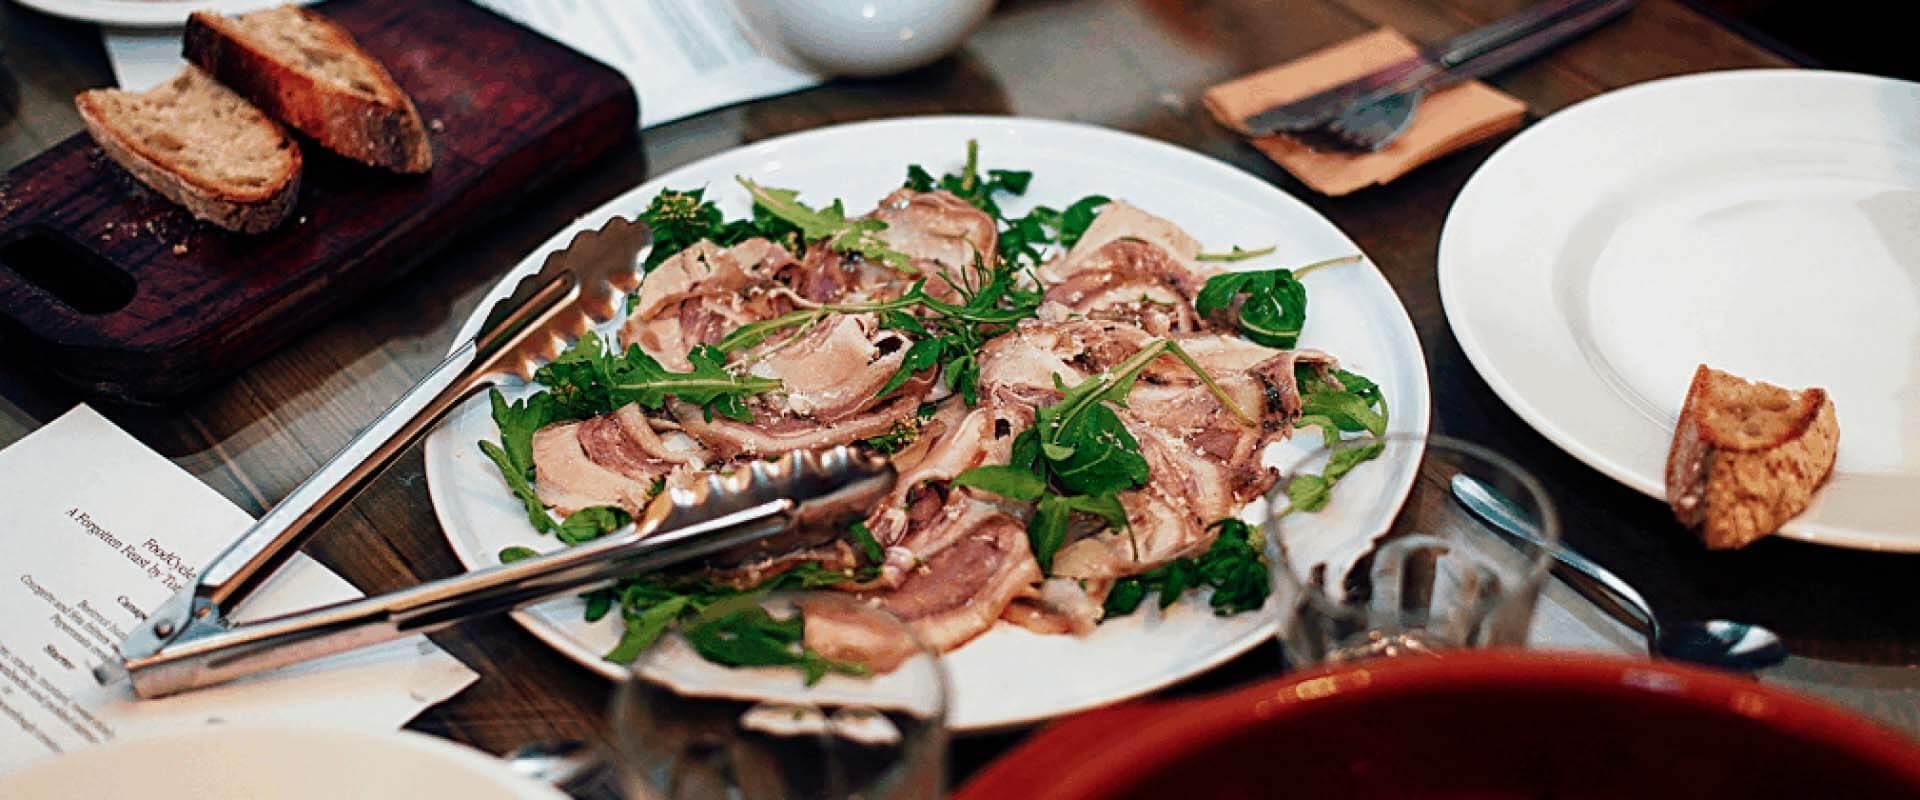 Porchetta di Testa – Rolled Pig's Head